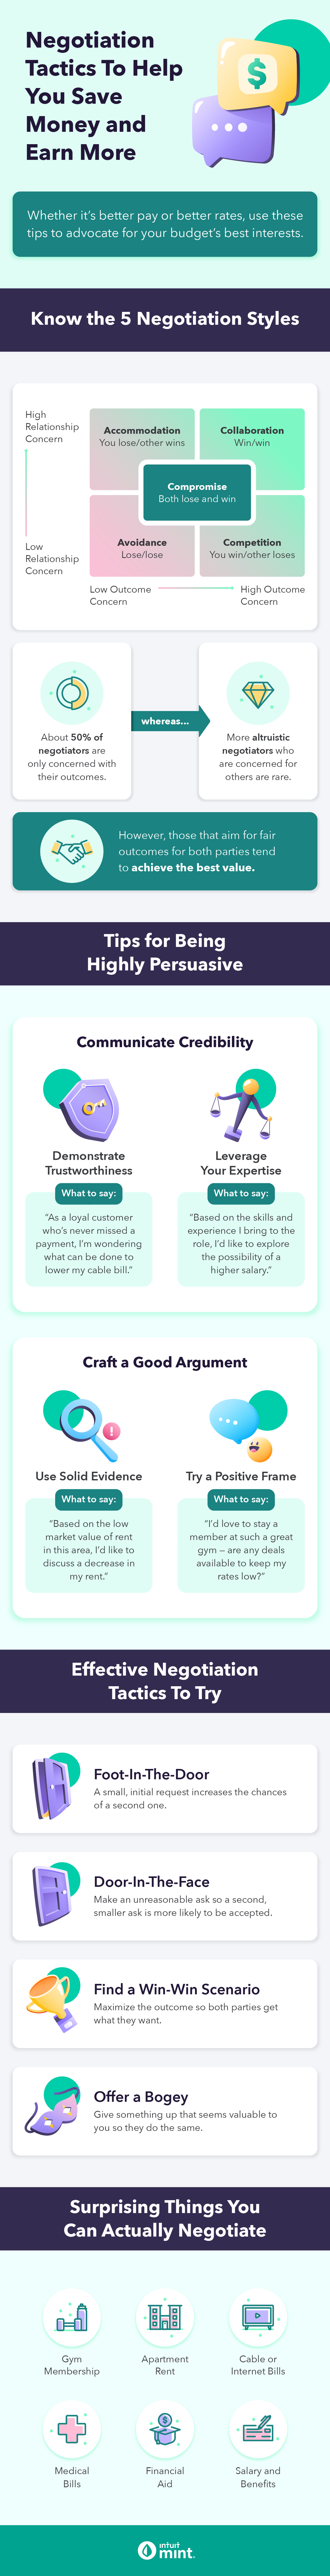 negotiation-tactics-save-money-earn-more